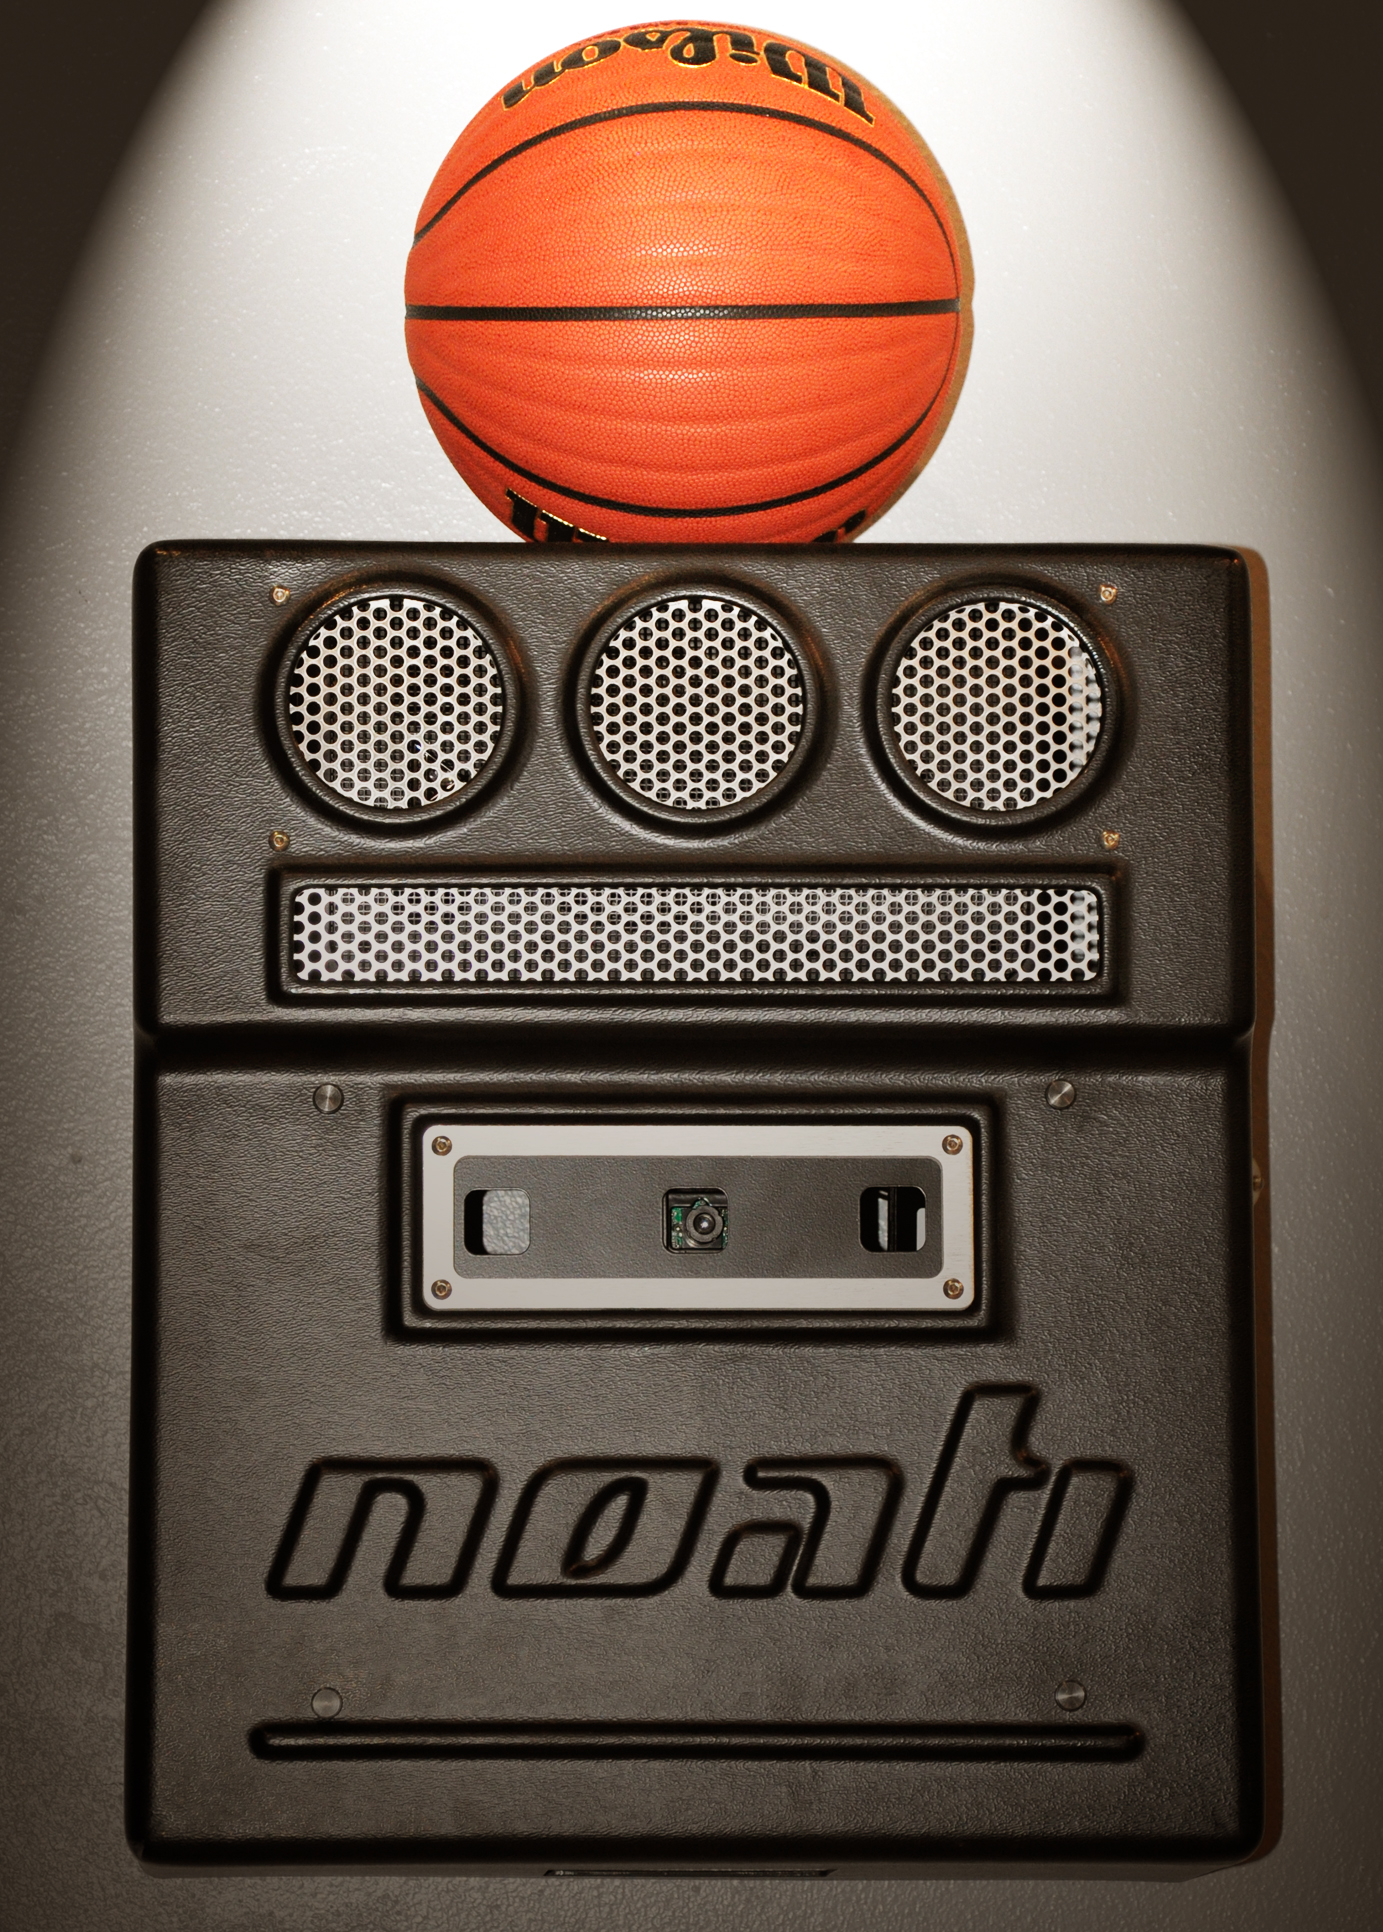 The Noah Basketball Coach Referral Program